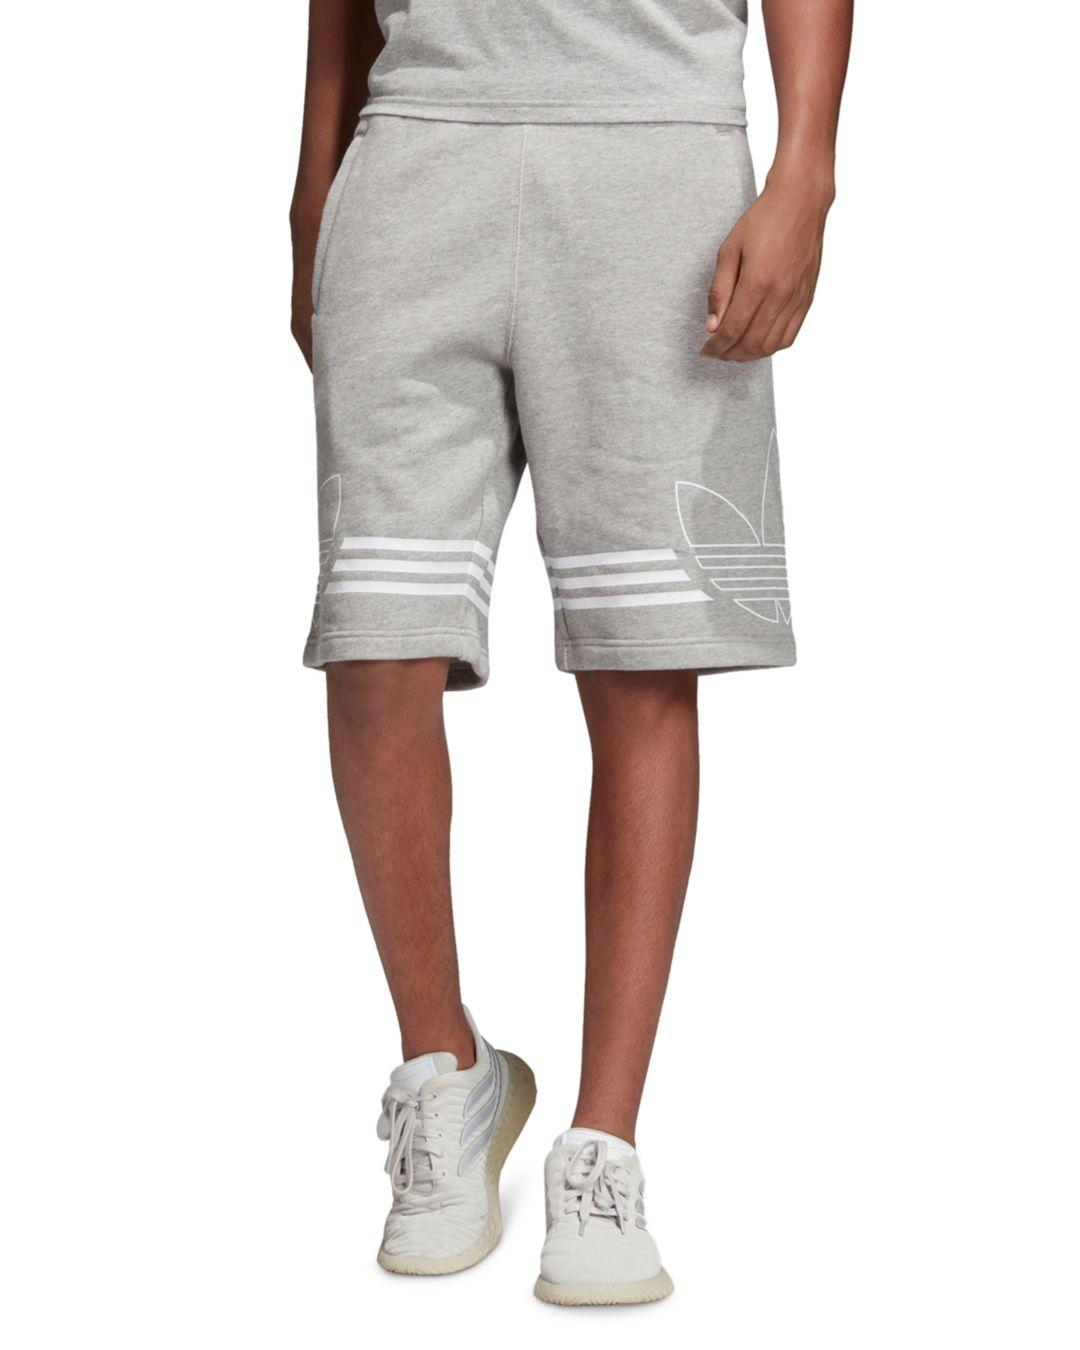 new product ed175 24beb adidas Originals. Mens Gray Outline Logo Shorts